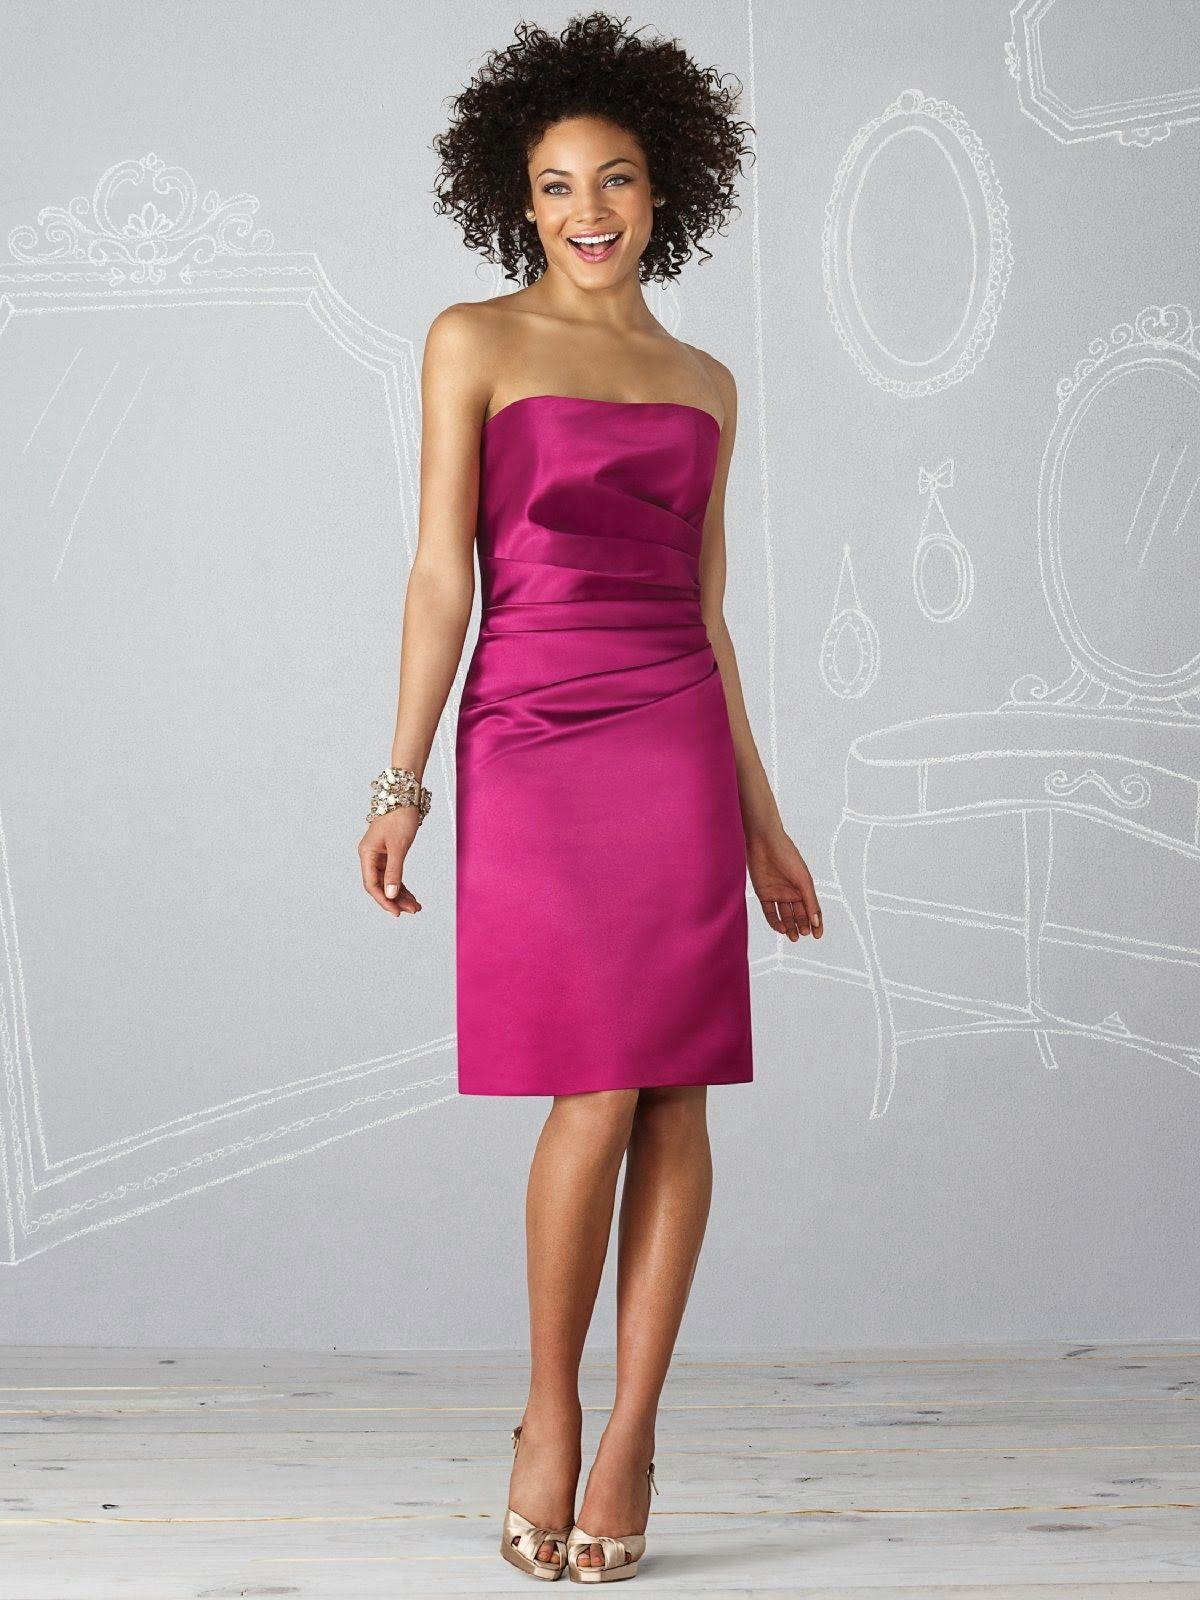 Diseños de vestidos de damas de honor | Women\'s fashion | Pinterest ...